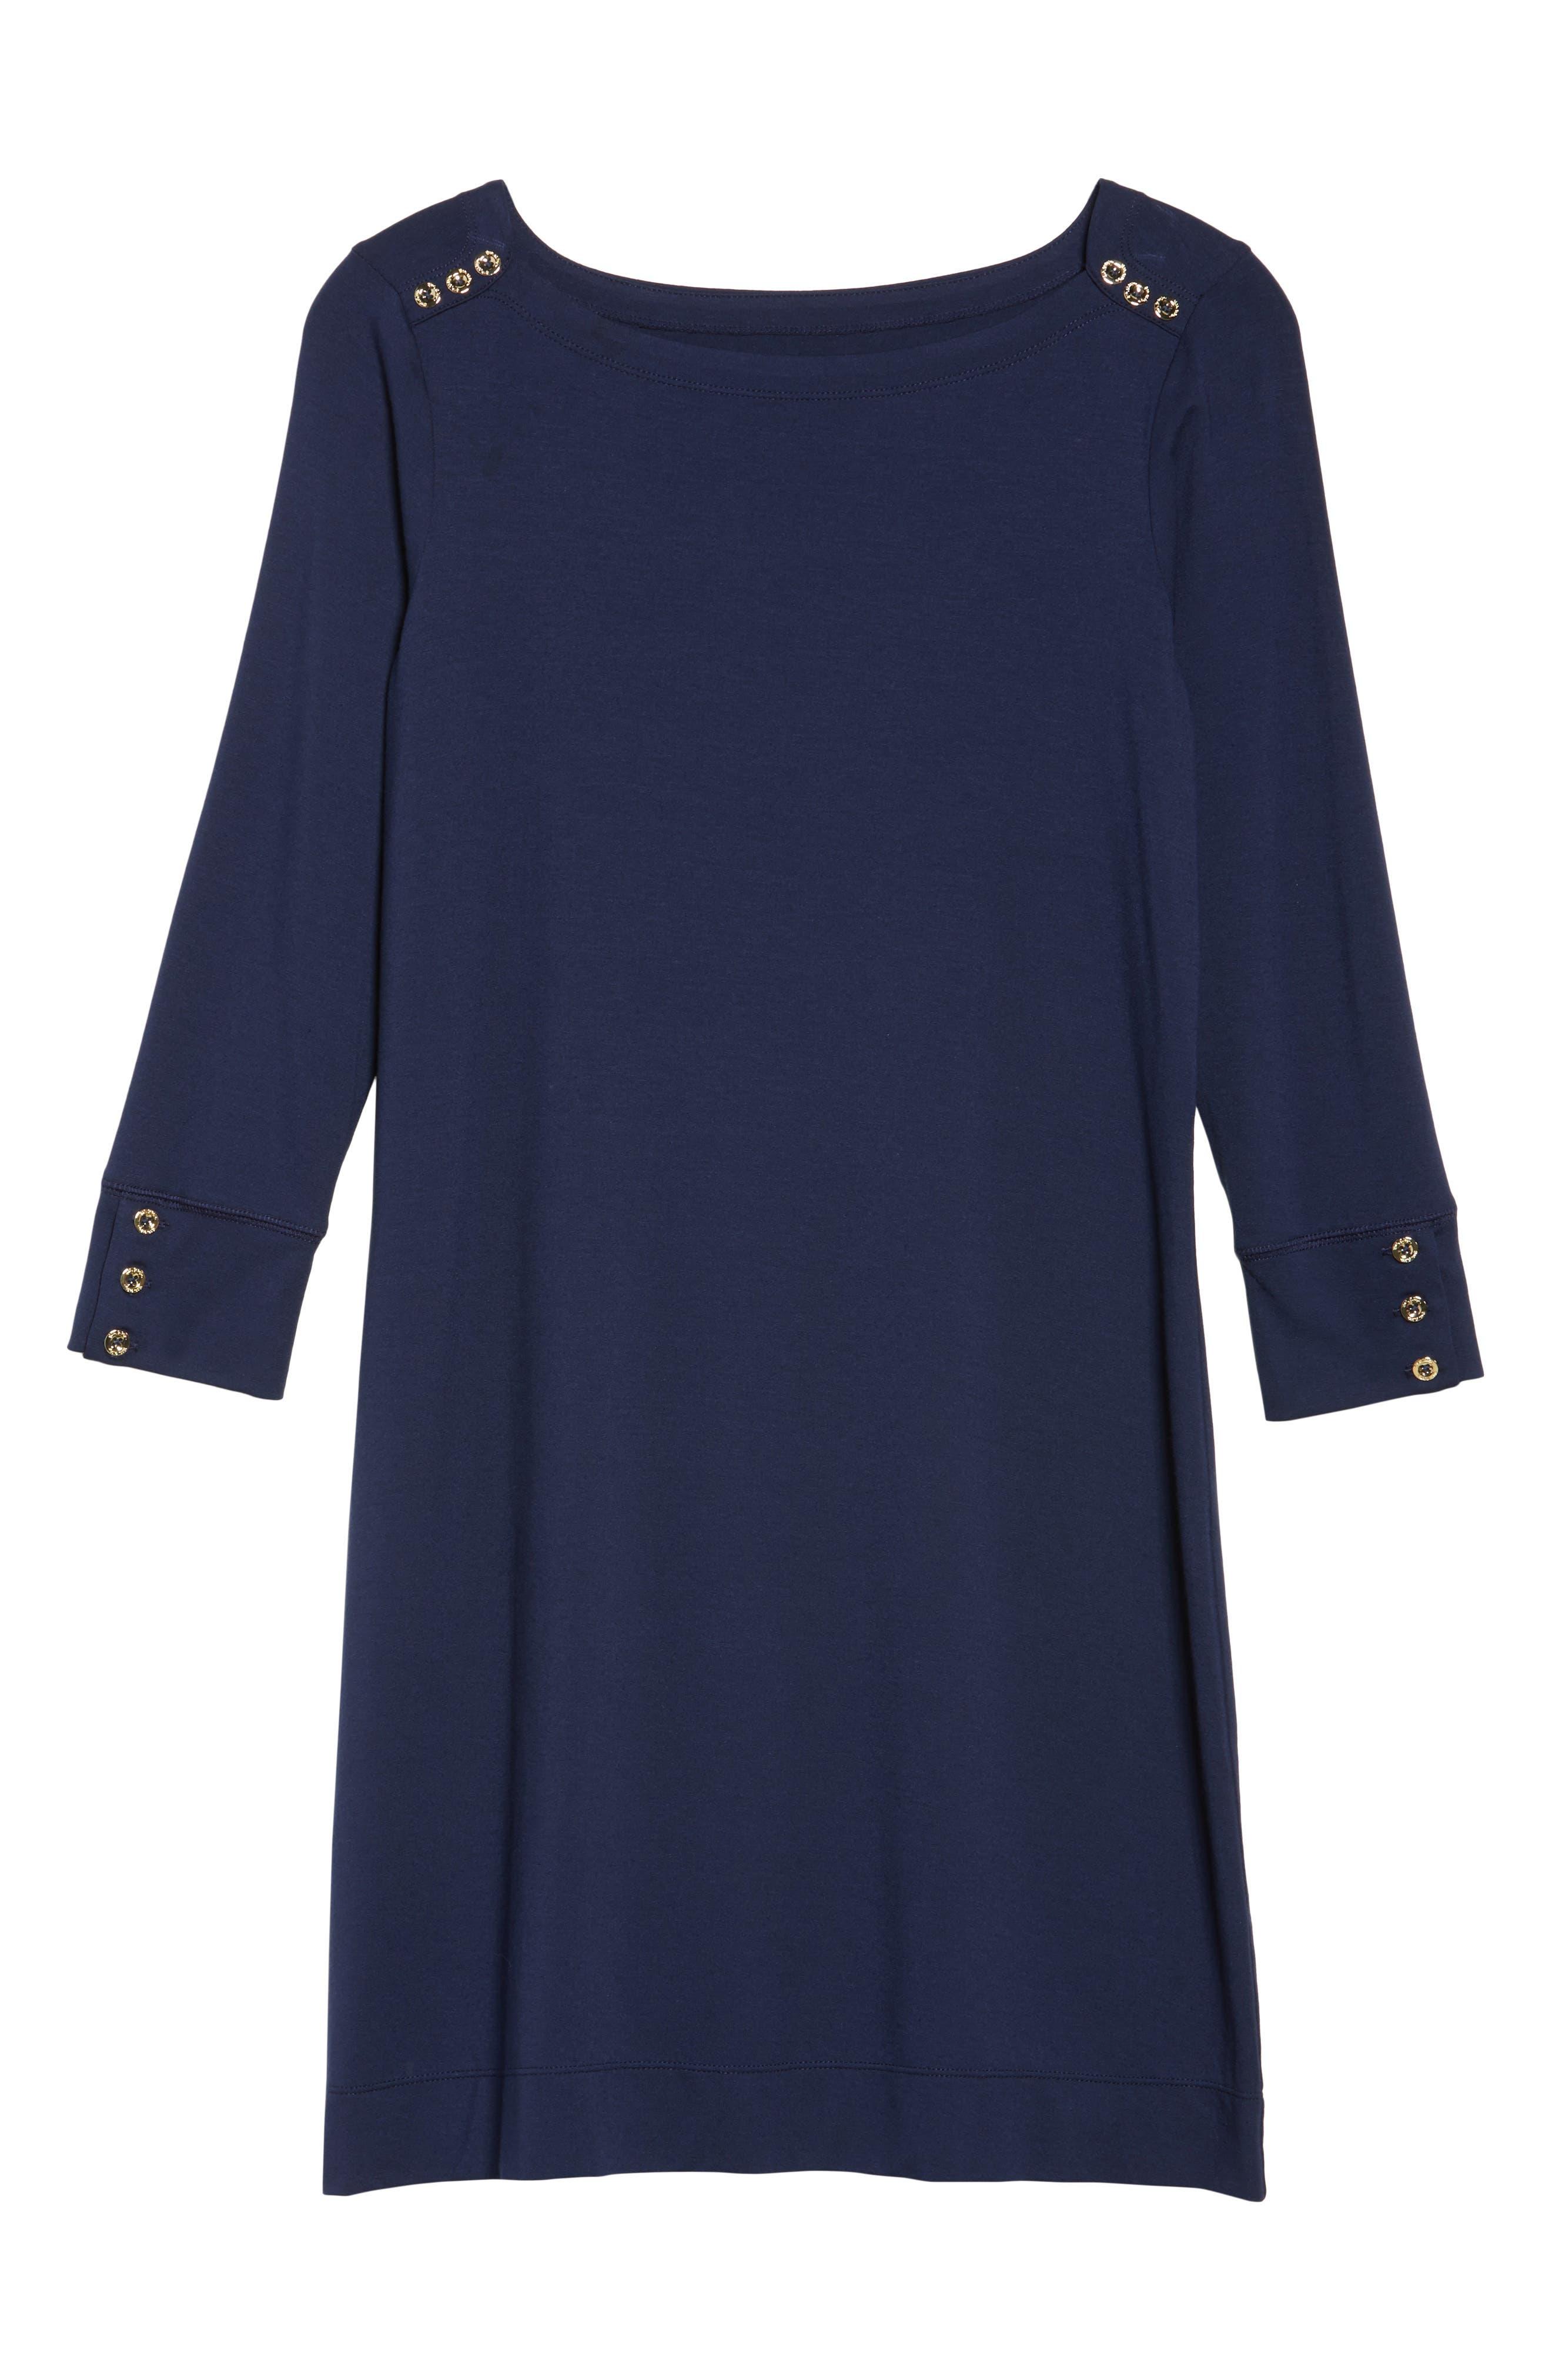 Sophie UPF 50+ Dress,                             Alternate thumbnail 6, color,                             True Navy